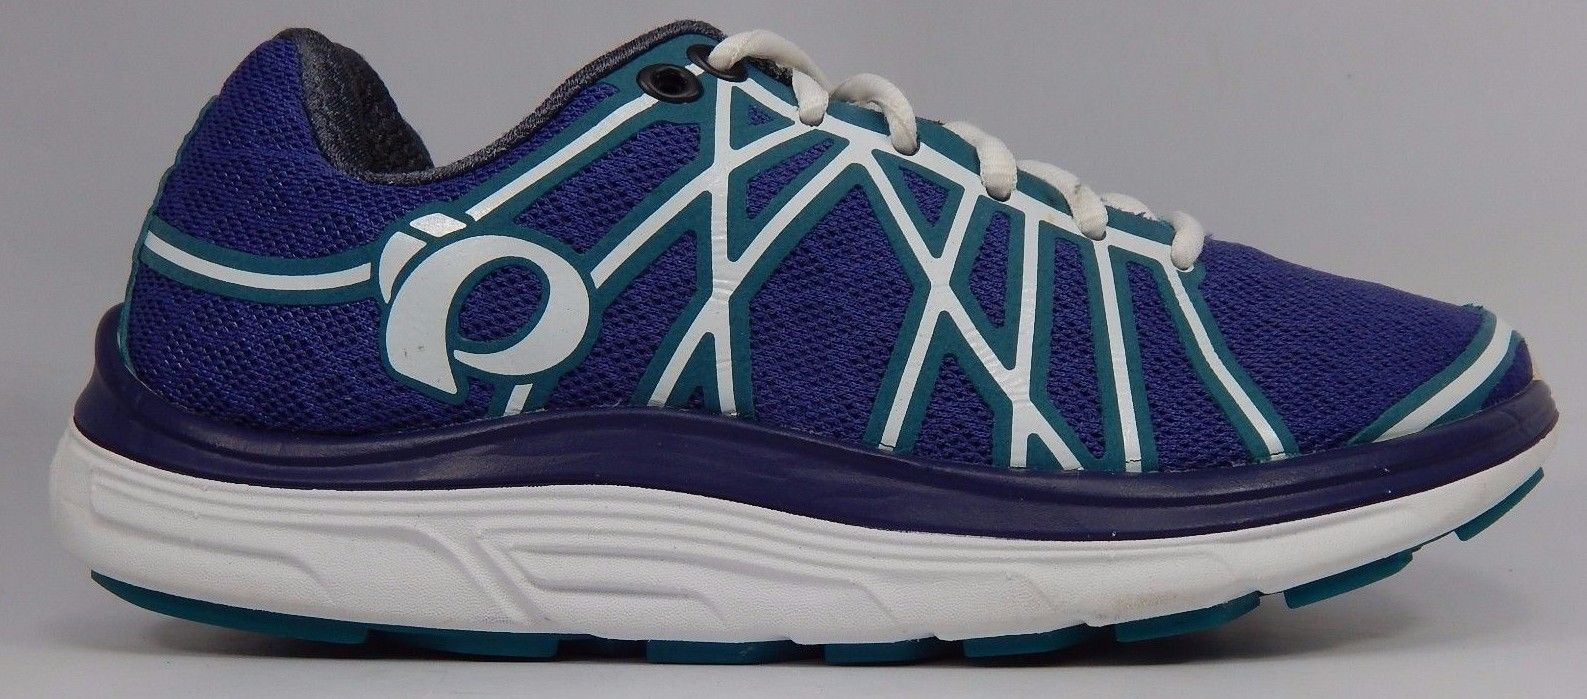 Pearl Izumi EM Road M3 v2 Women's Running Shoes Size US 7.5 M (B) EU 38.5 Purple